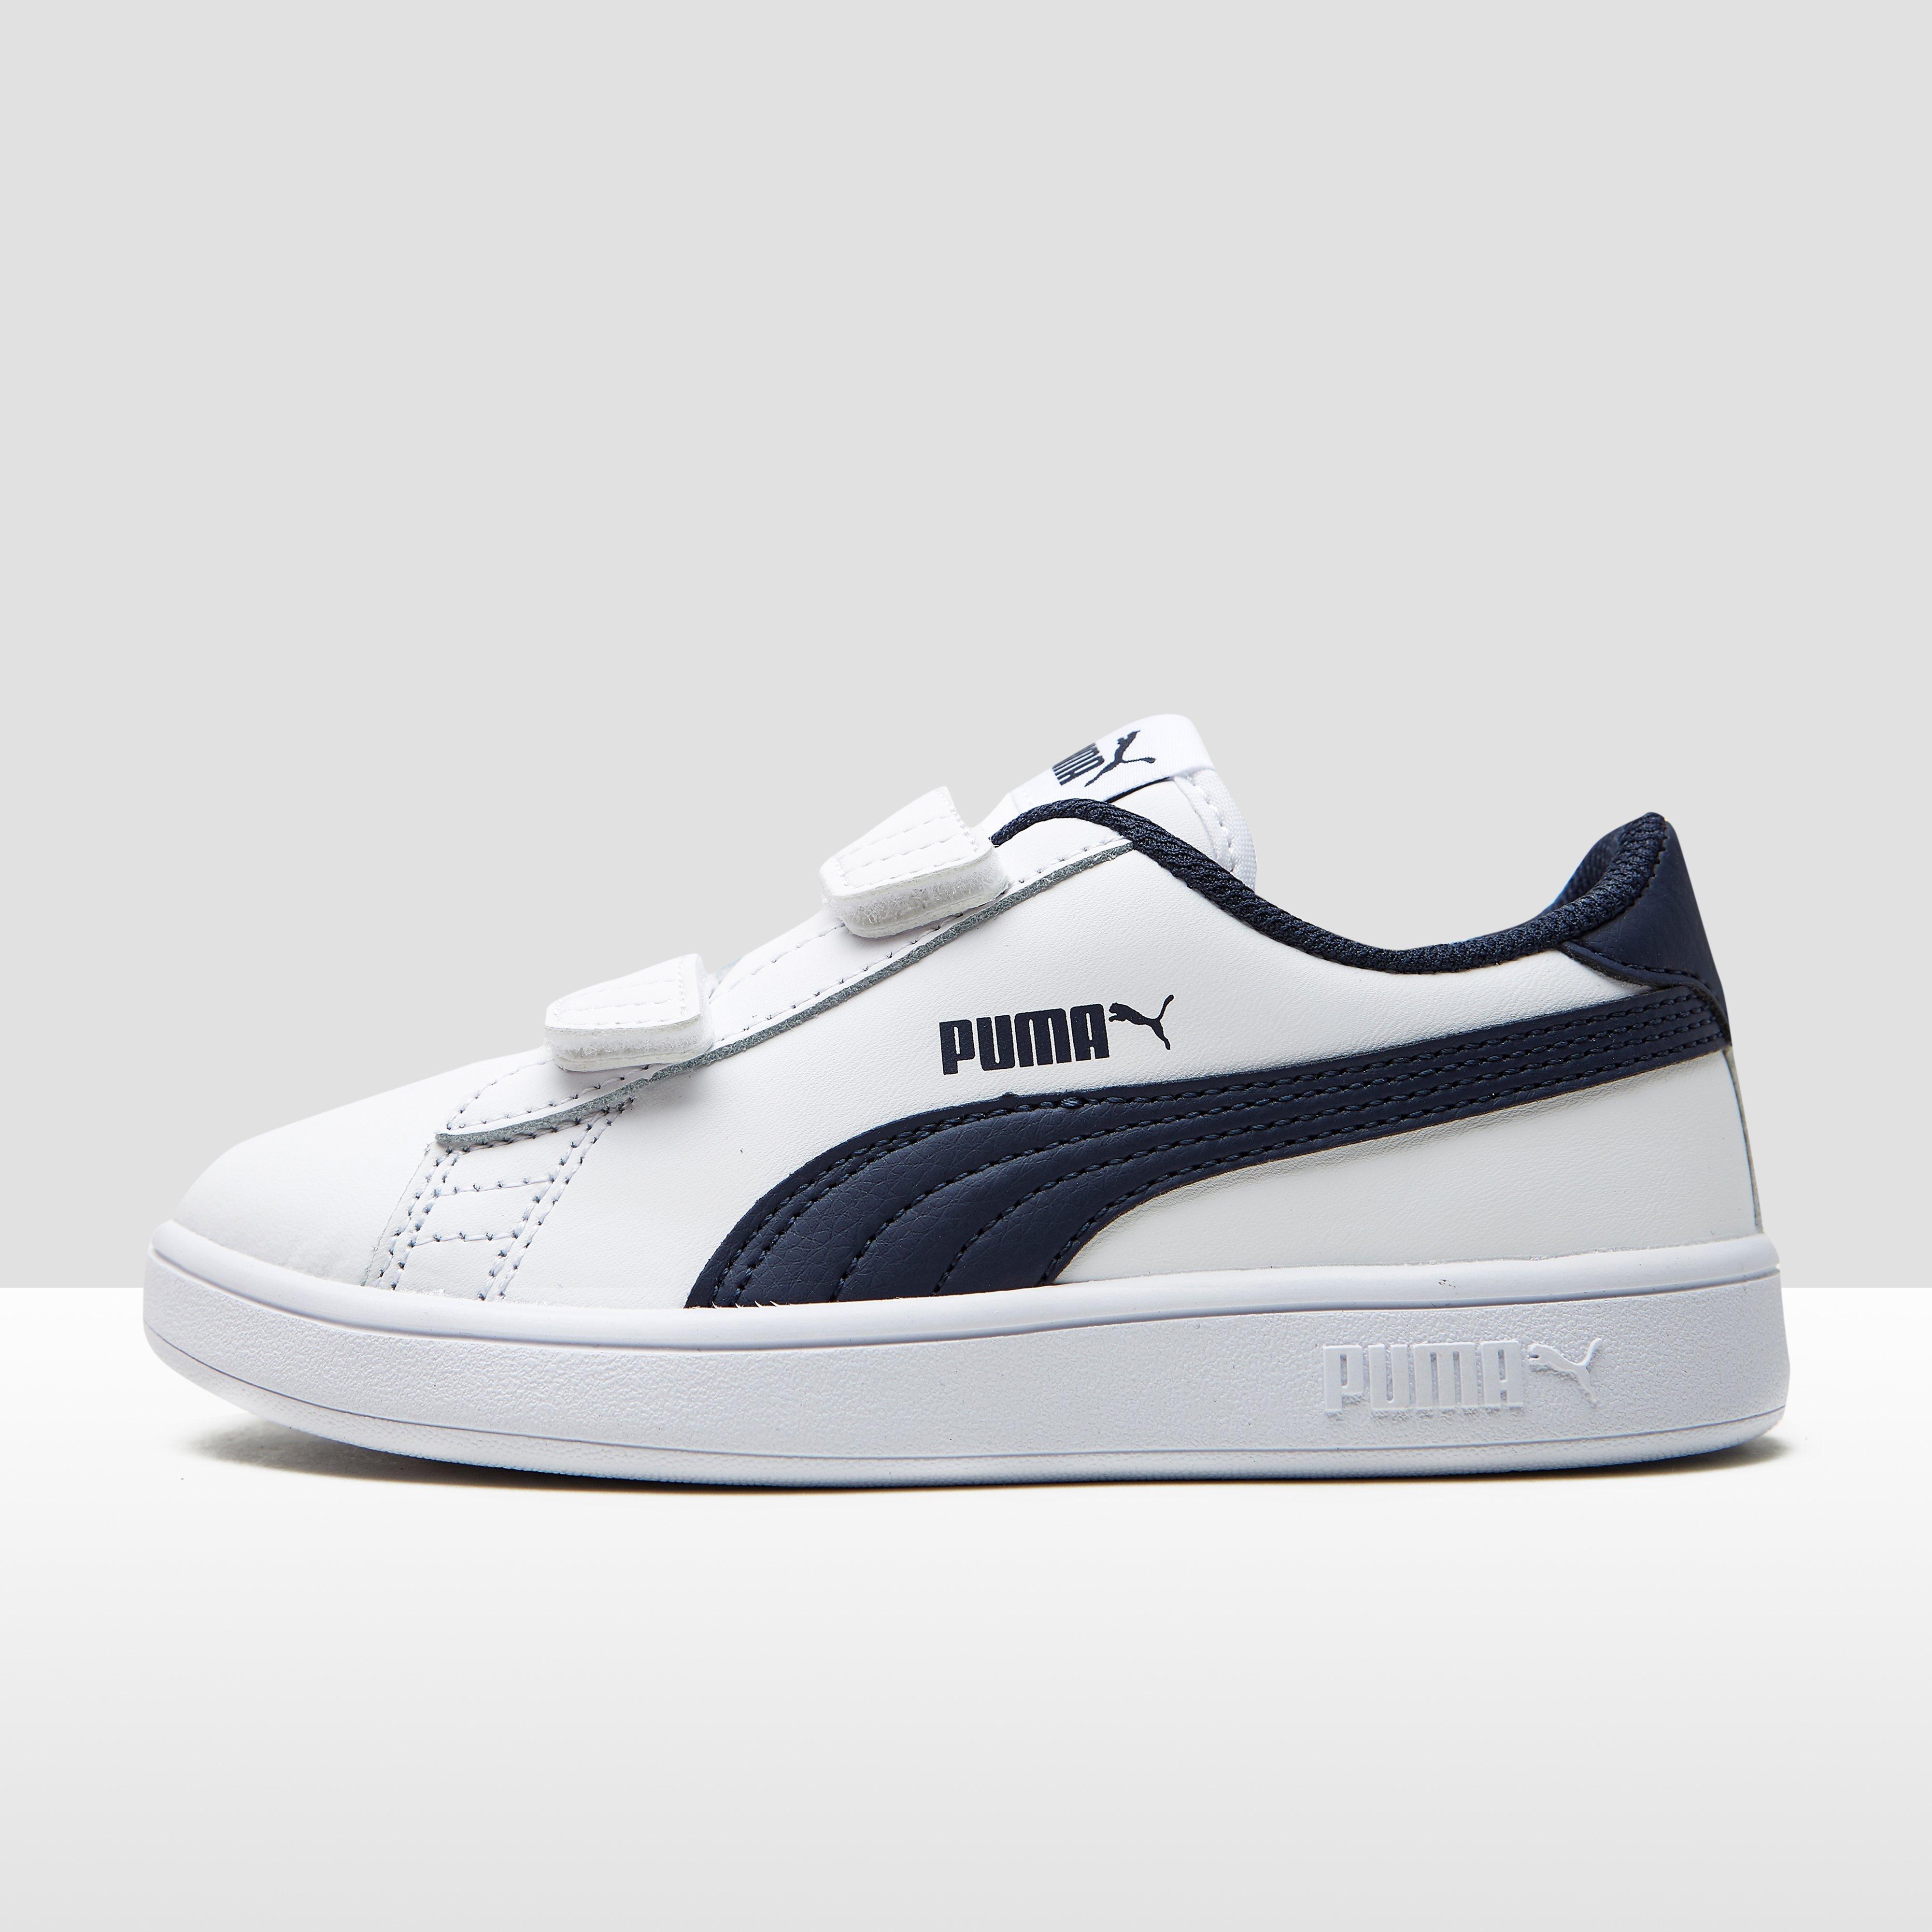 Pumas - Smash Baskets V2 - Hommes - Chaussures - Bleu - 47 EwyCJk1hqg